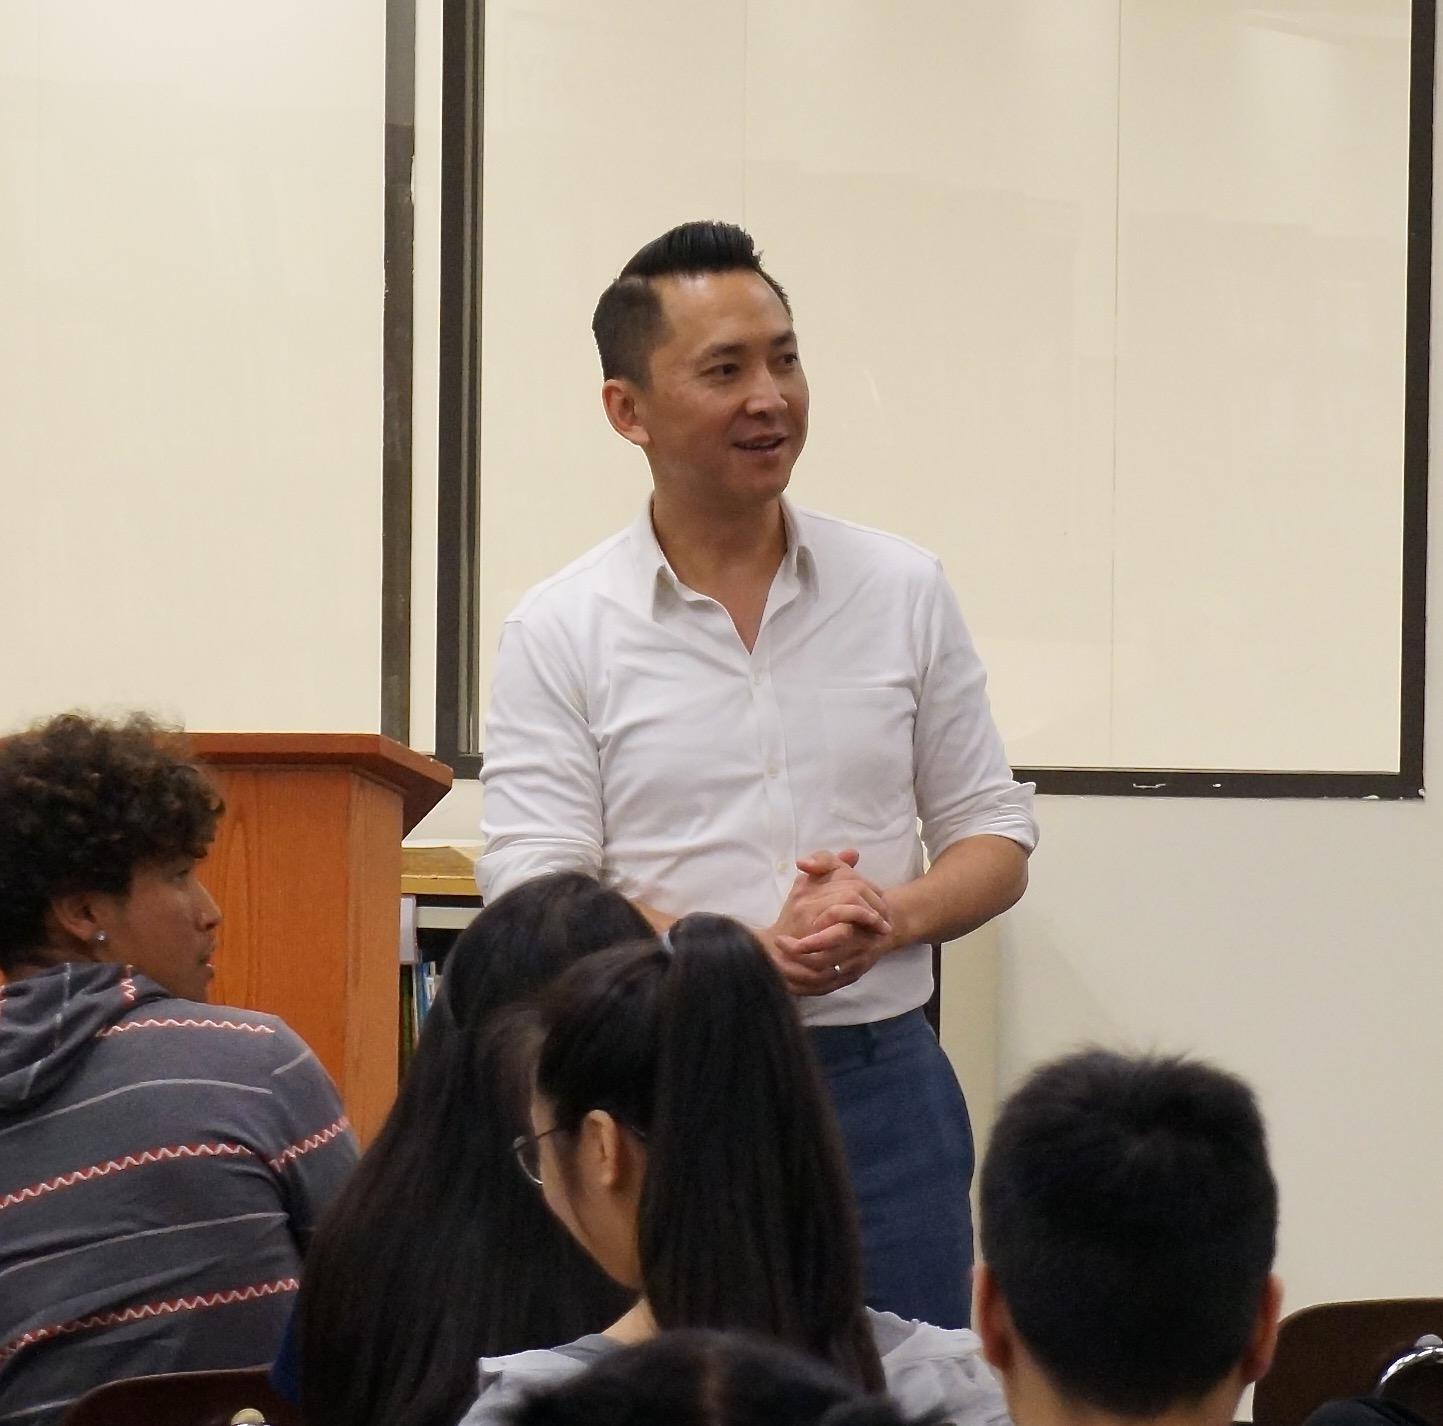 Viet Thanh Nguyen visits Reynolds High School